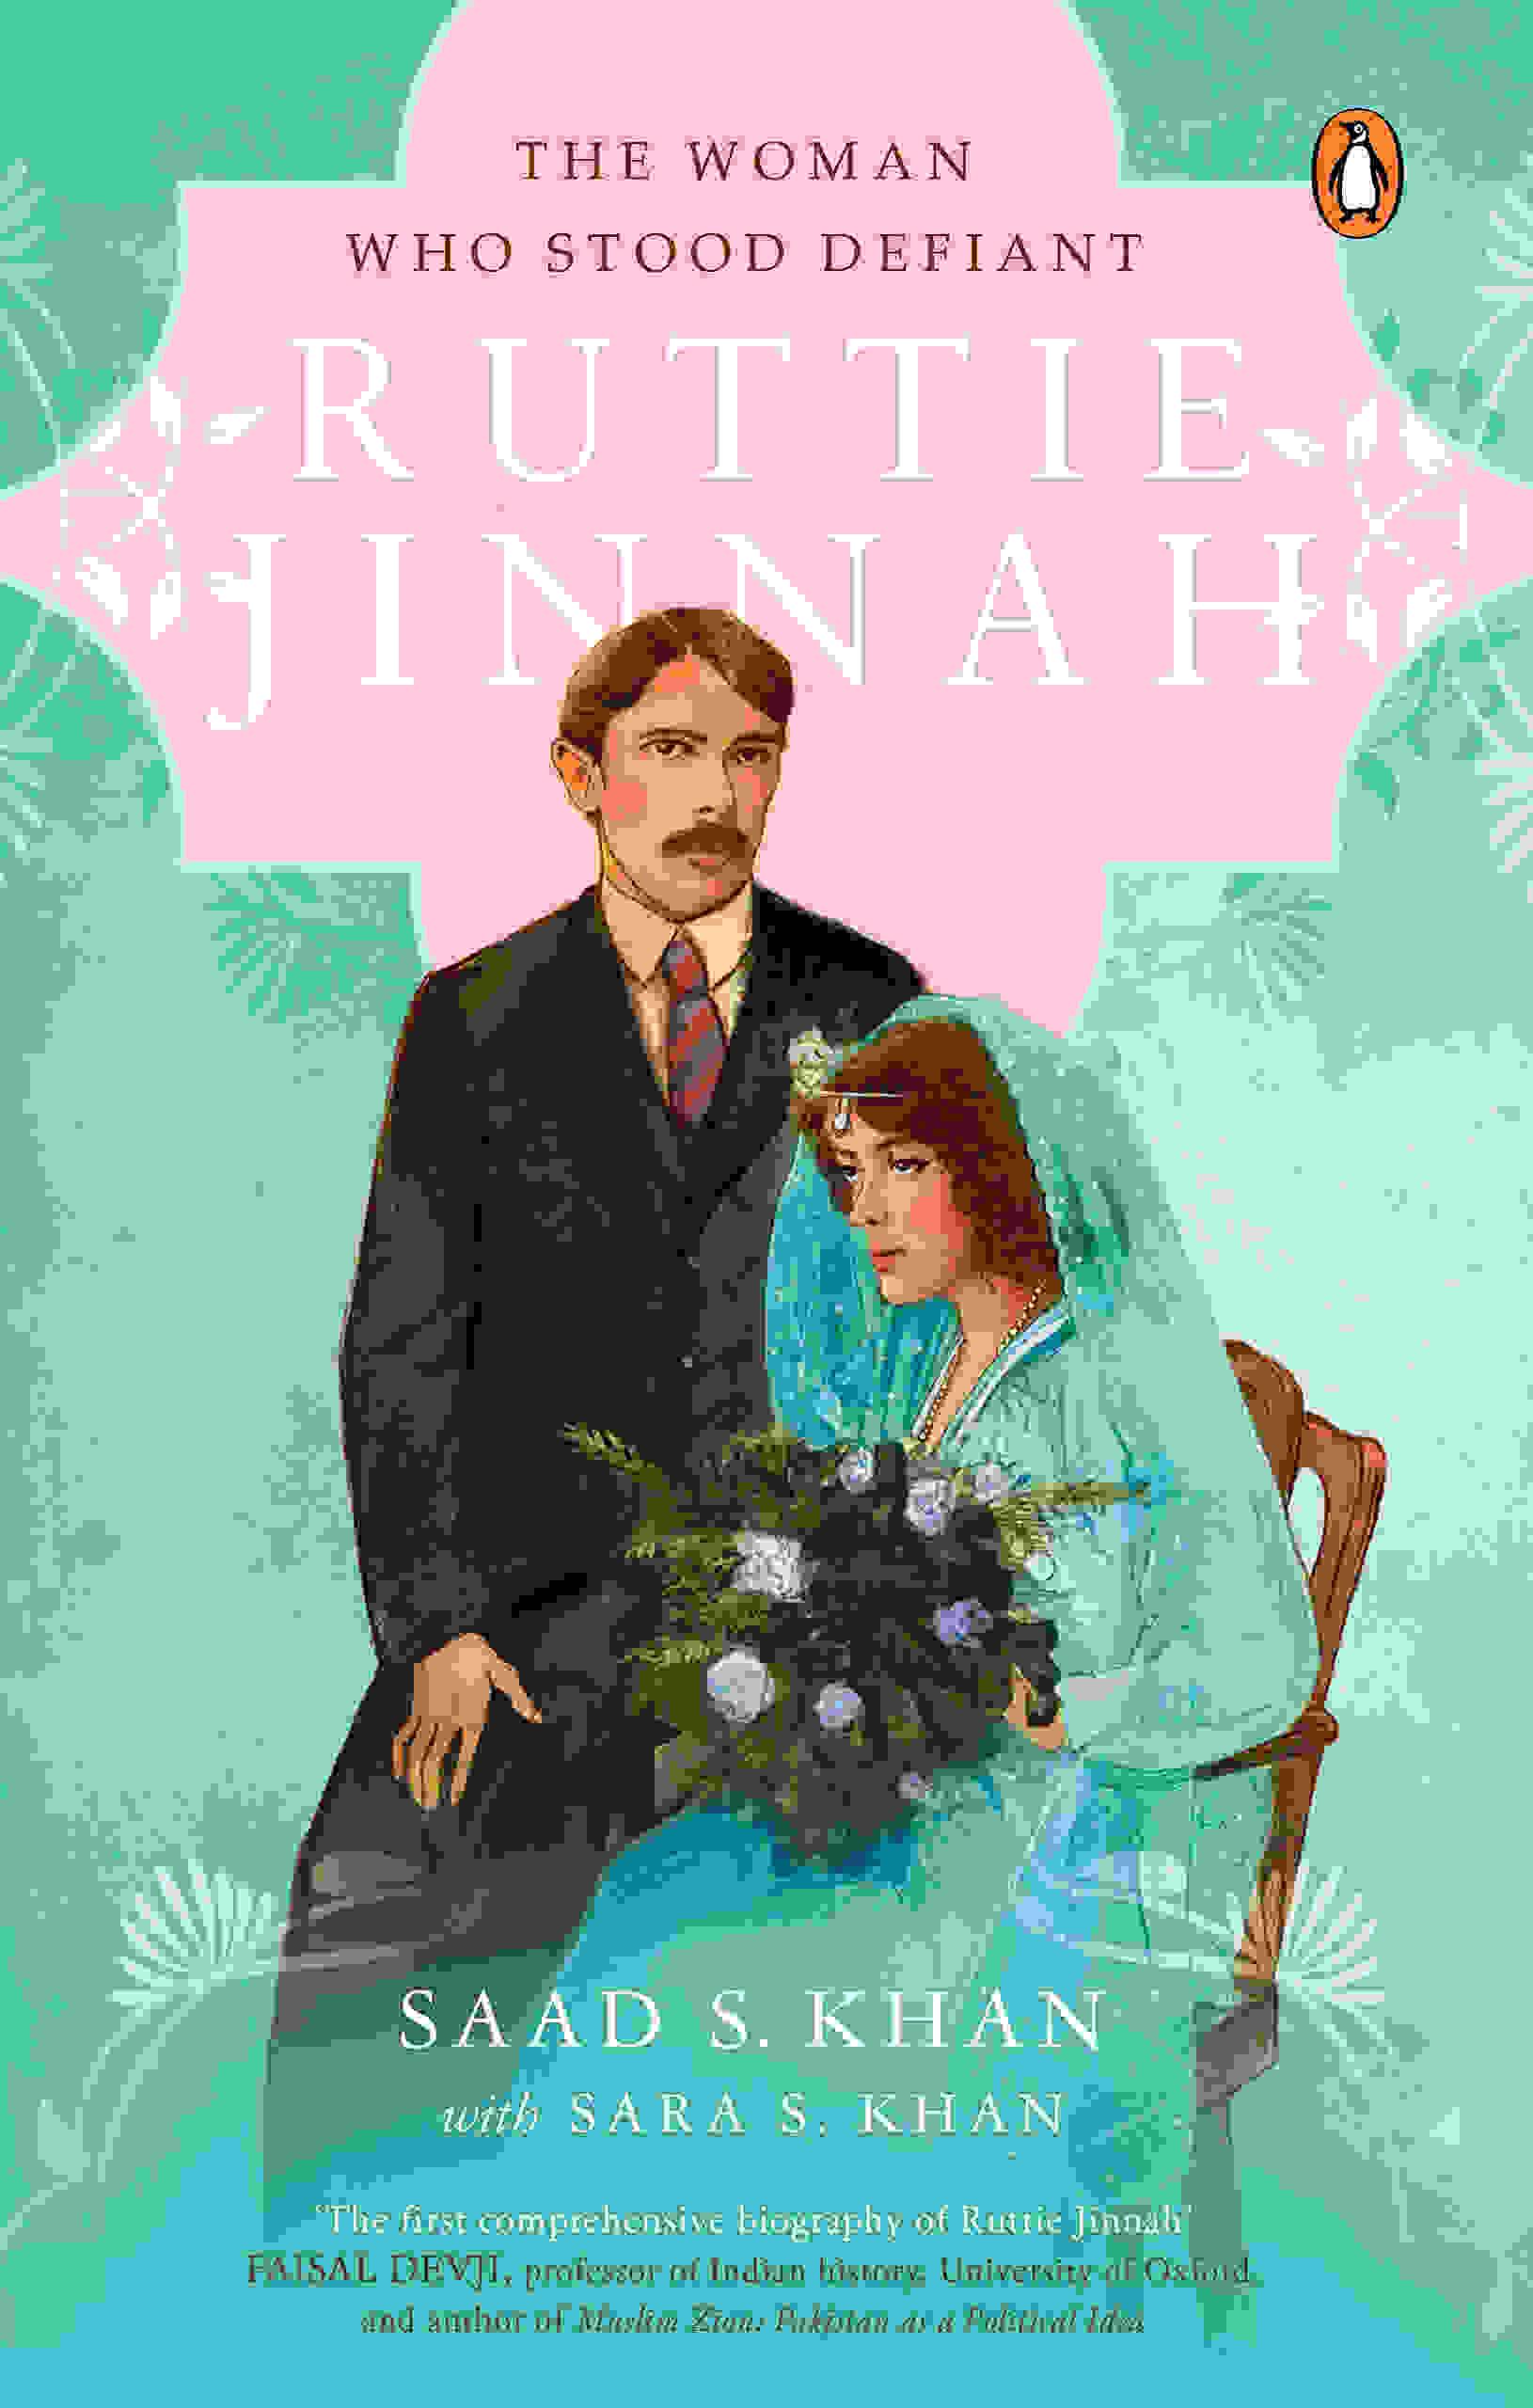 Ruttie Jinnah: The Woman Who Stood Defiant by Saad S. Khan and Sara S. Khan, Ebury, Rs 599